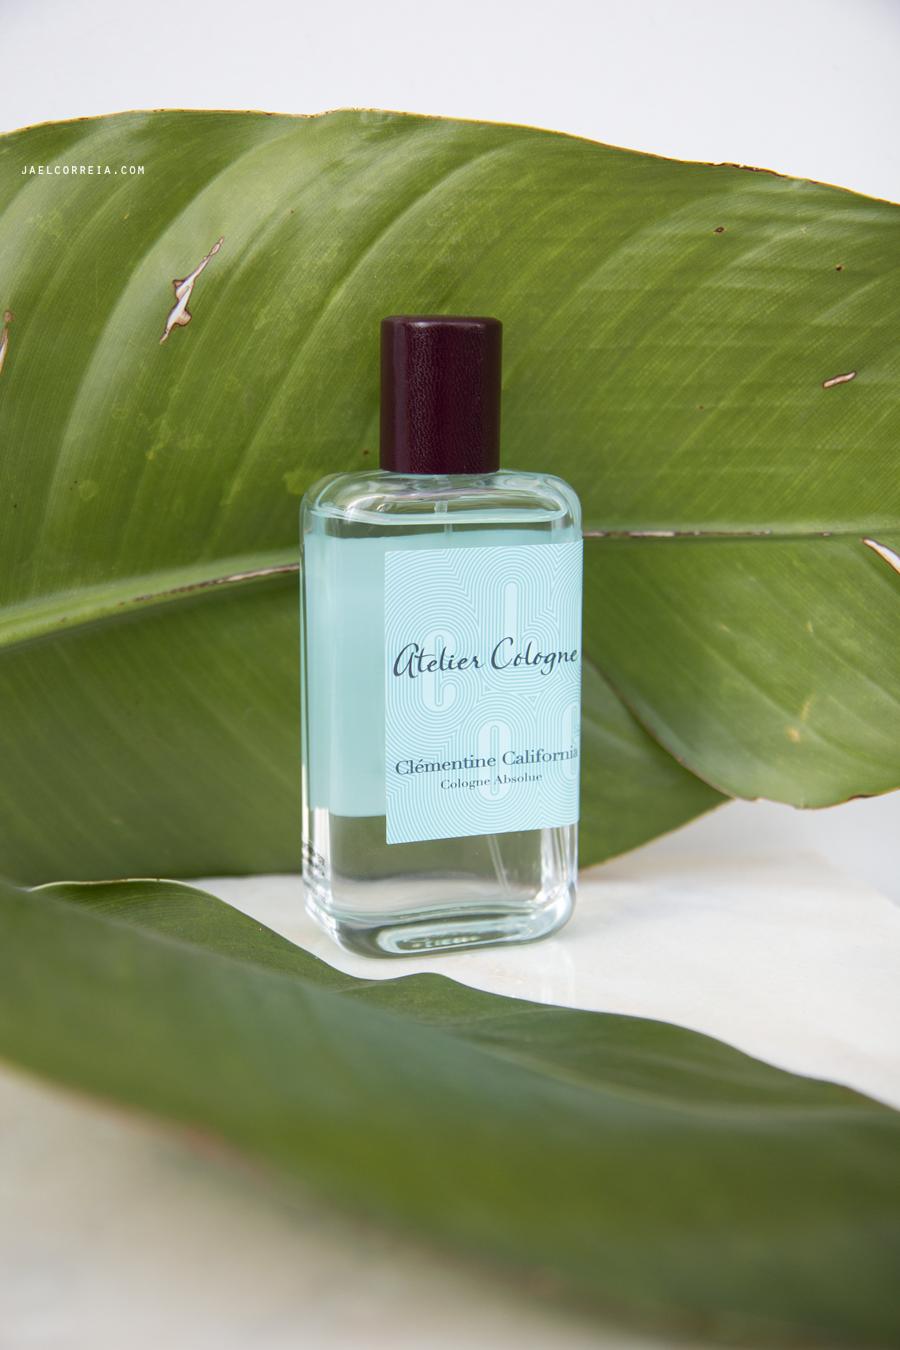 atelier cologne clementine california jael correia portugal perfumes parfum cologne absolue perfumes